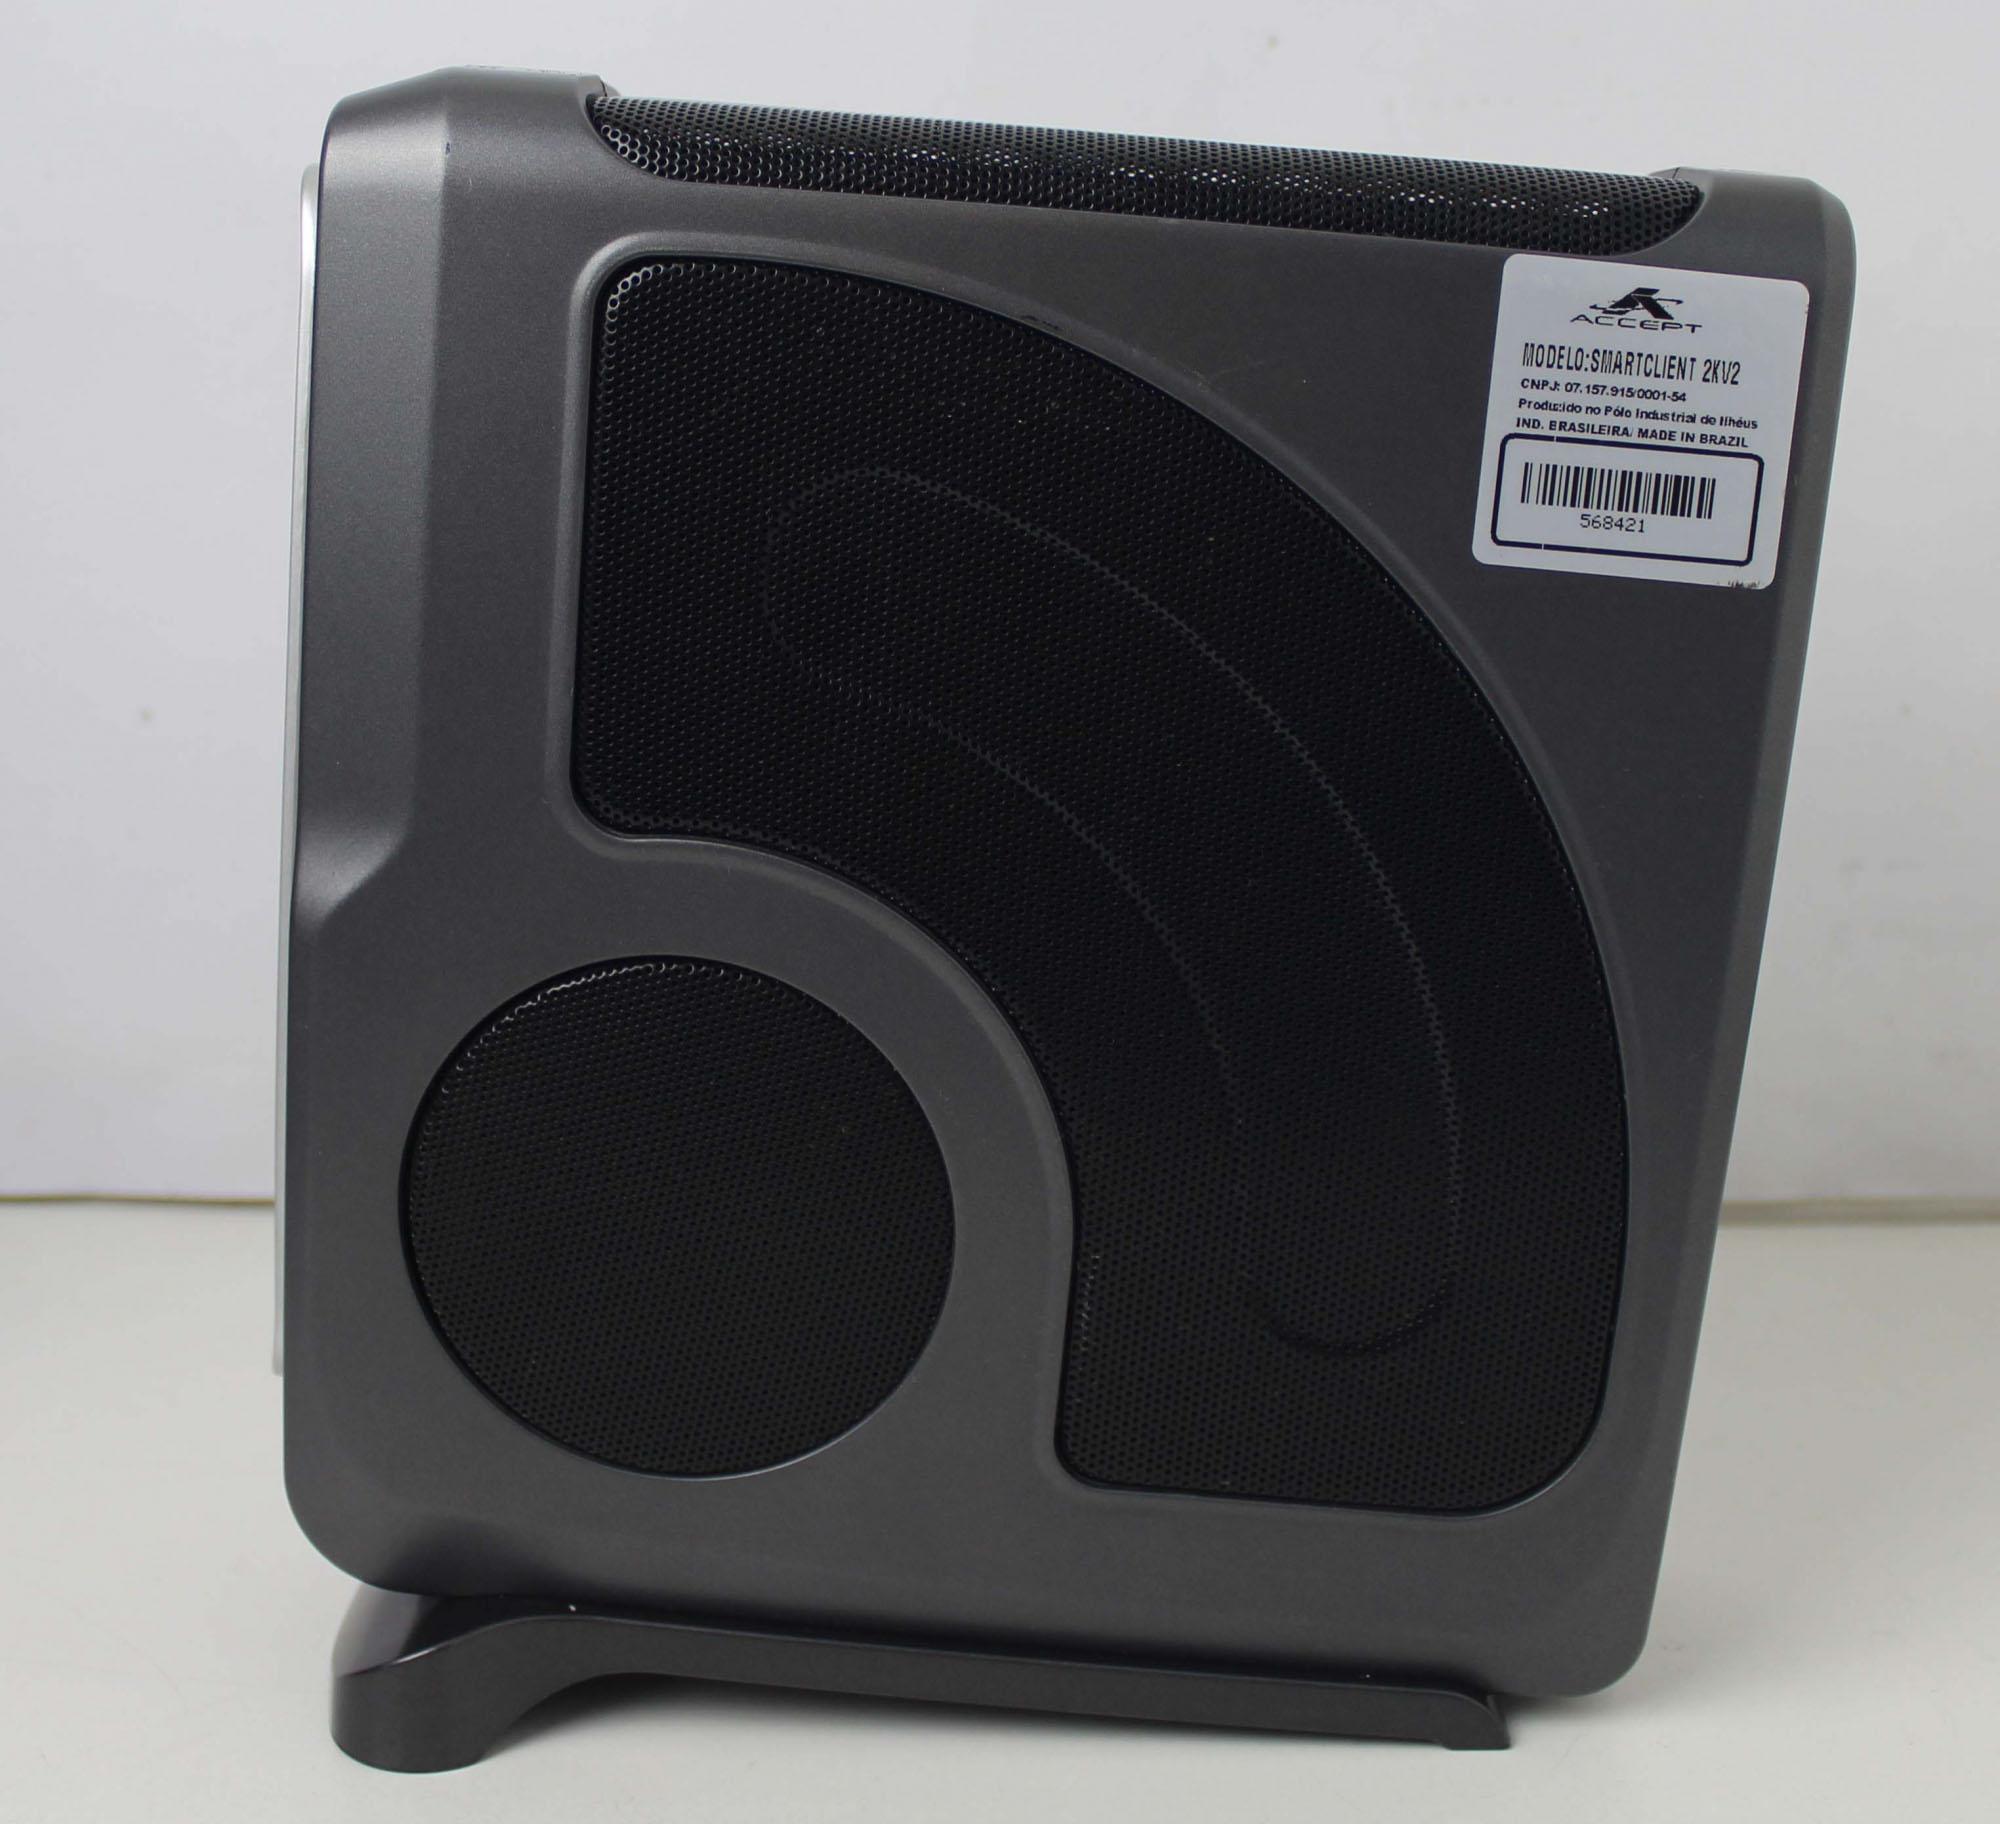 35 UNIDADES - MINI PC P/PDV ACCEPT SMART CLIENT 2KV2 DUAL CORE 2.41GHZ 8GB SSD-32GB (SERIAL DB9)